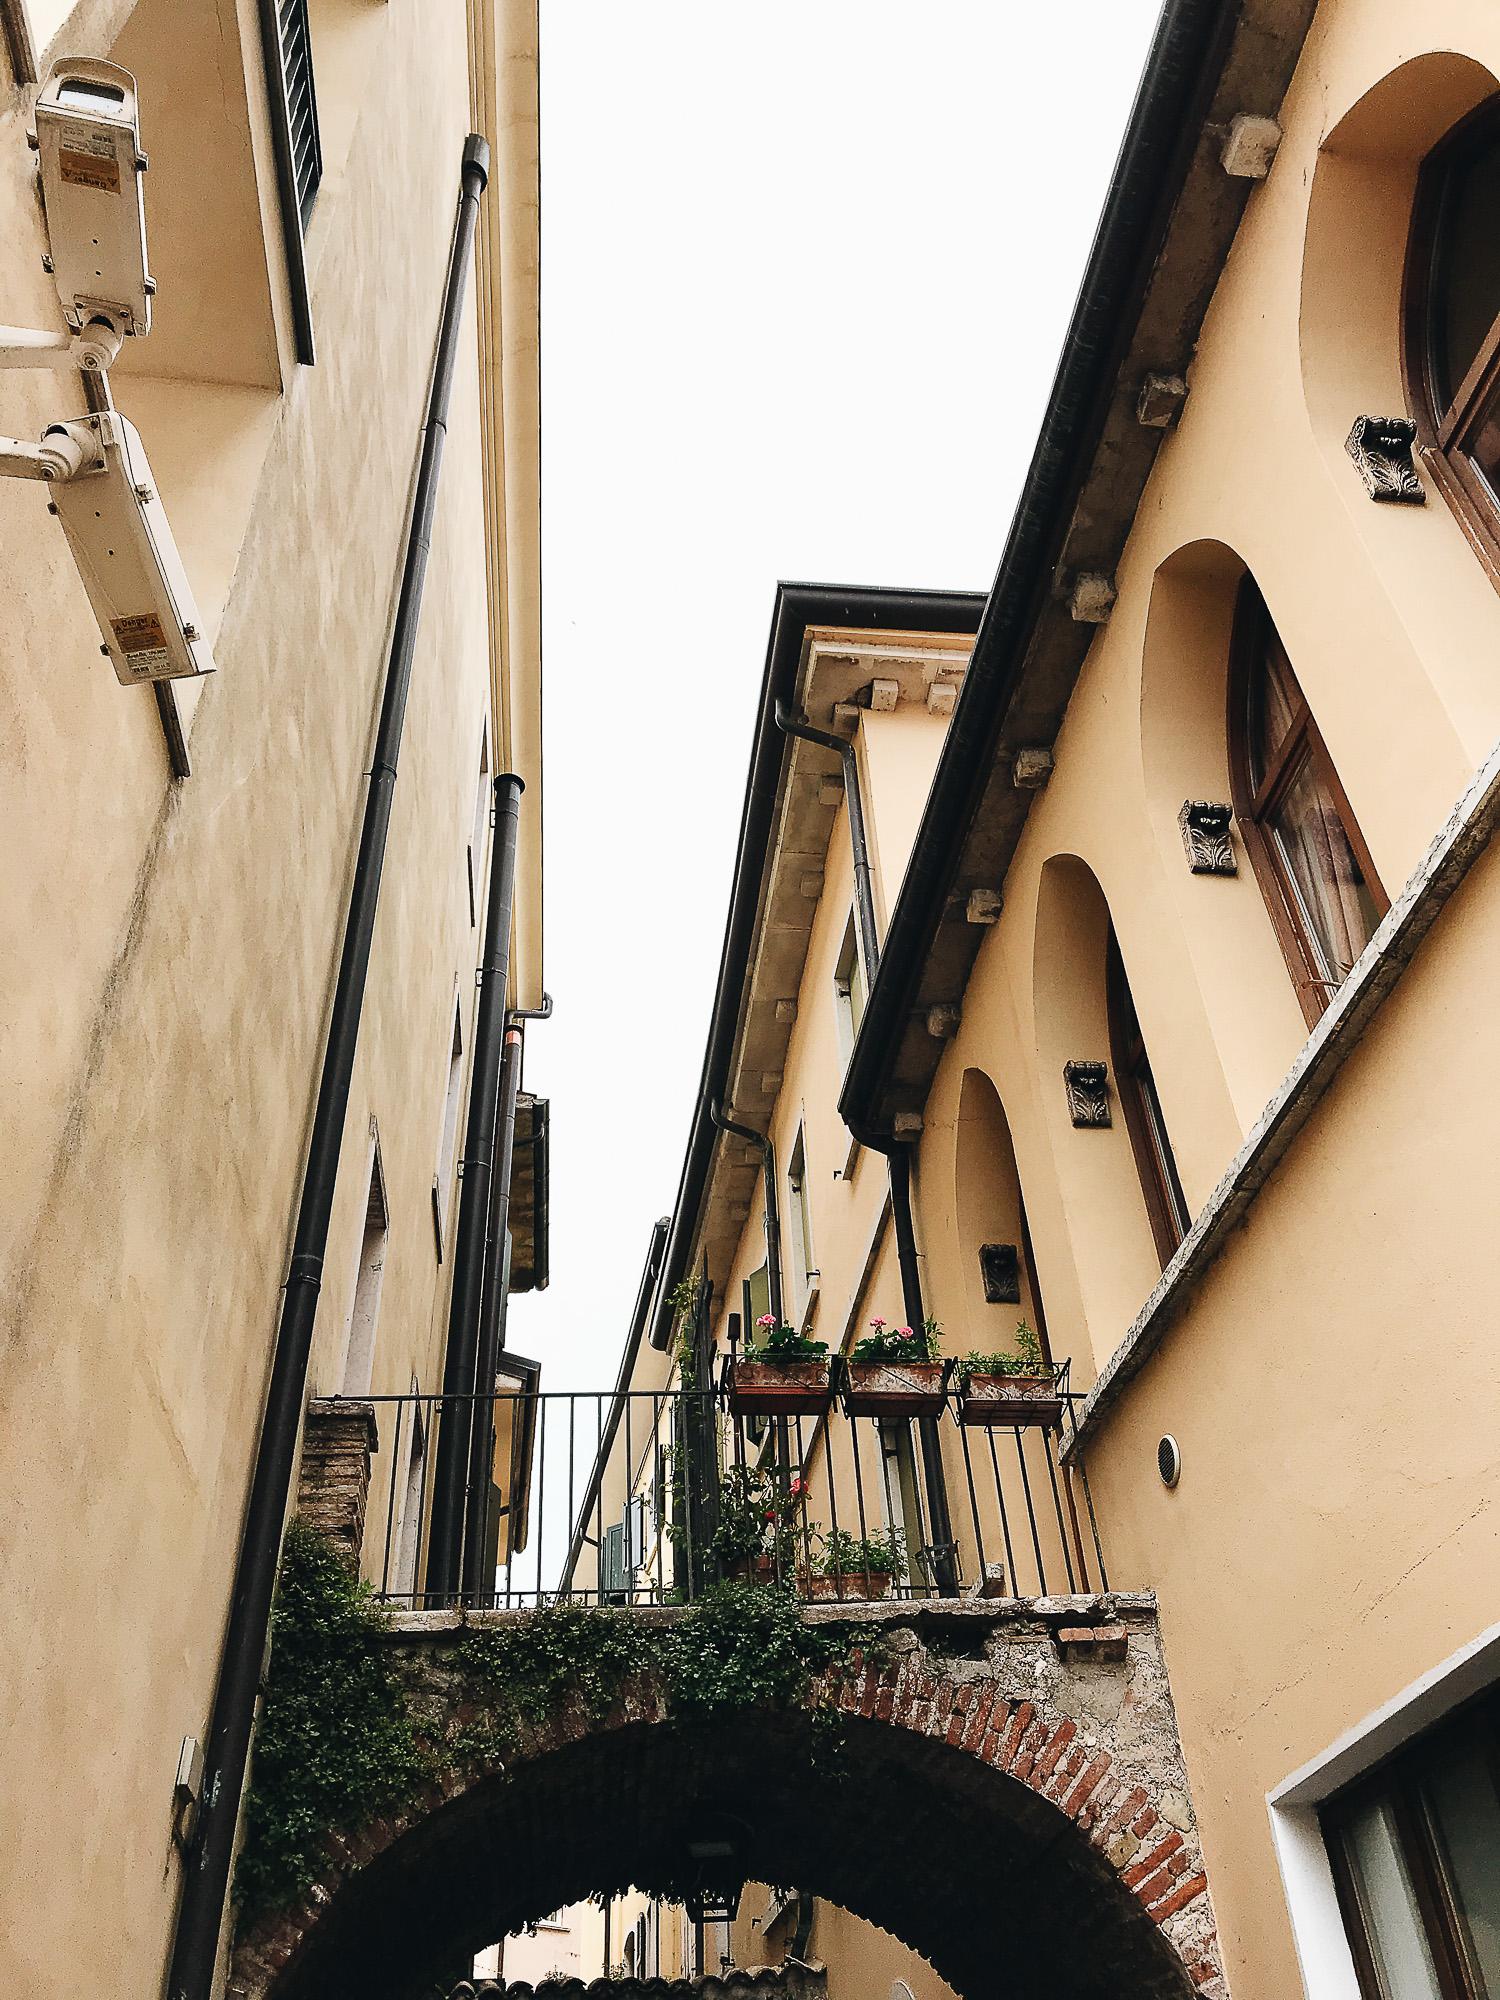 OurBeautifulAdventure-LakeGarda-Italy-Blog-6393.jpg